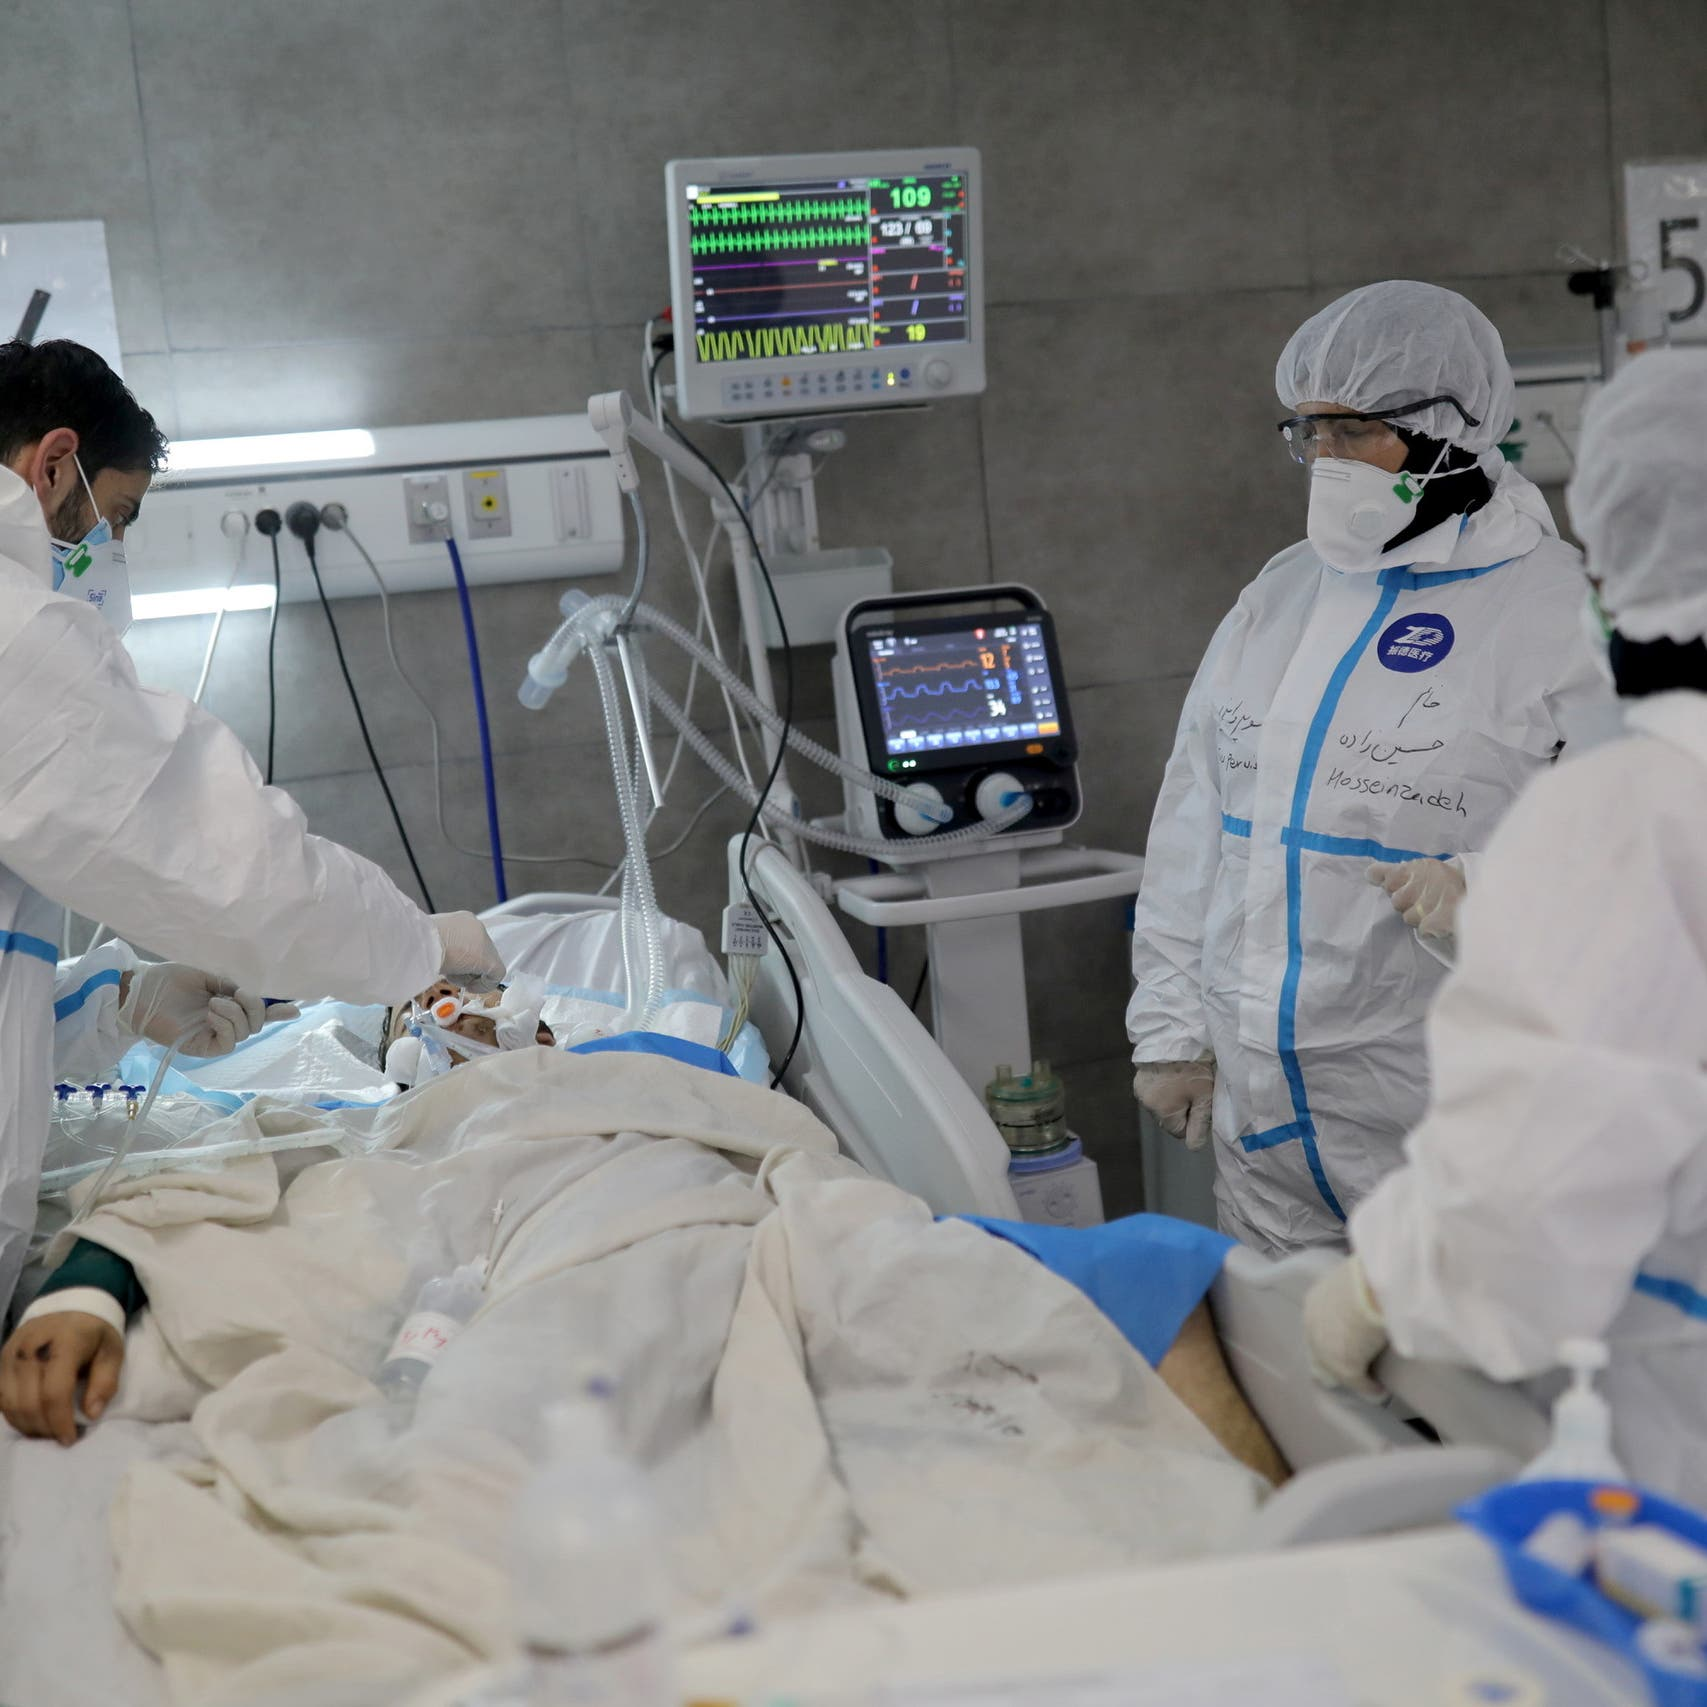 Iran's COVID-19 cases top three million: Health ministry